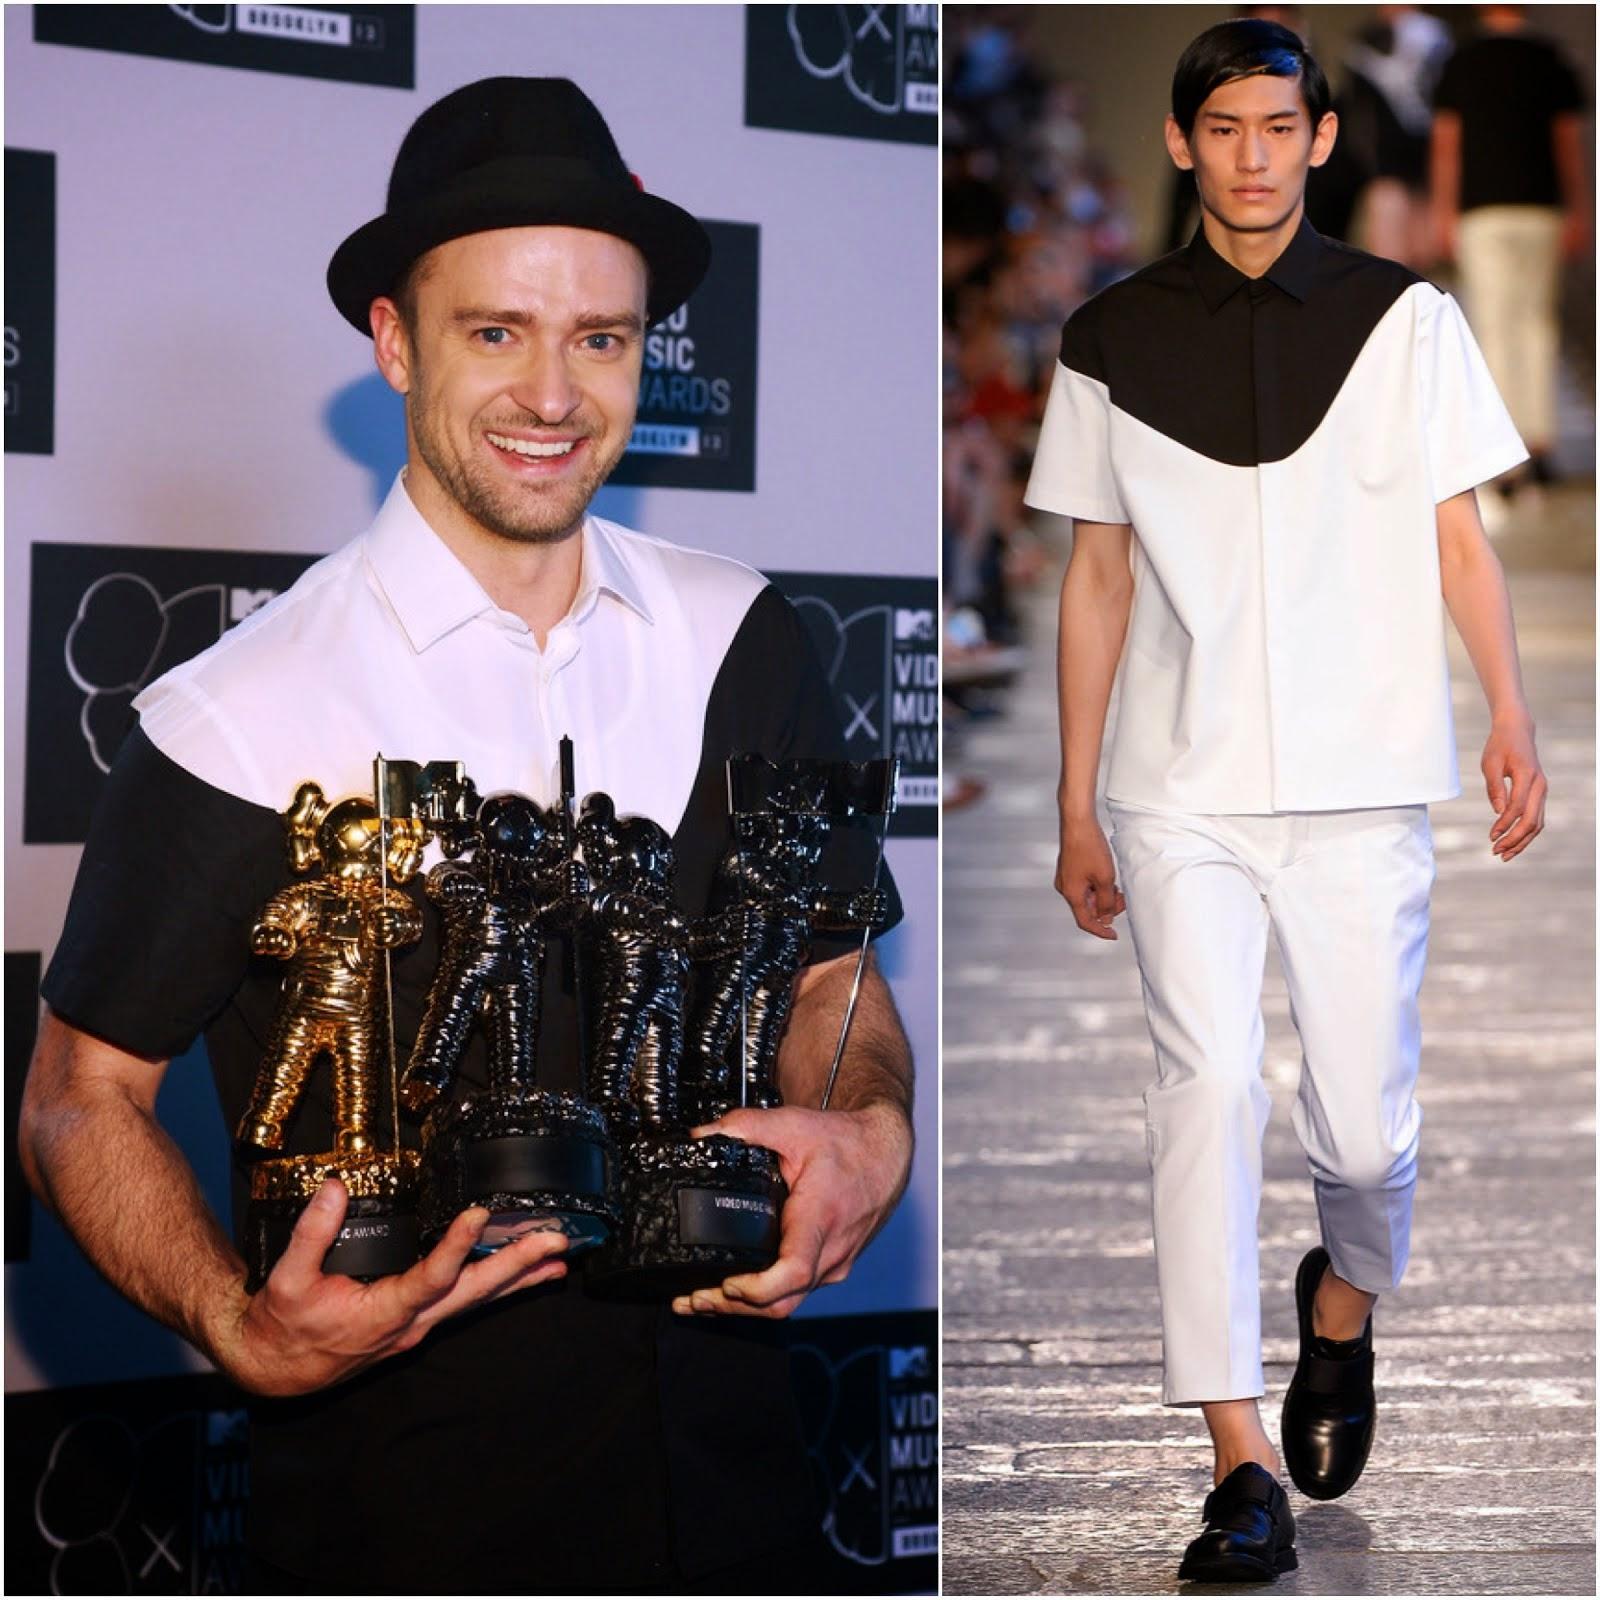 00O00 Menswear Blog: Justin Timberlake in Neil Barrett - 2013 MTV Video Music Awards